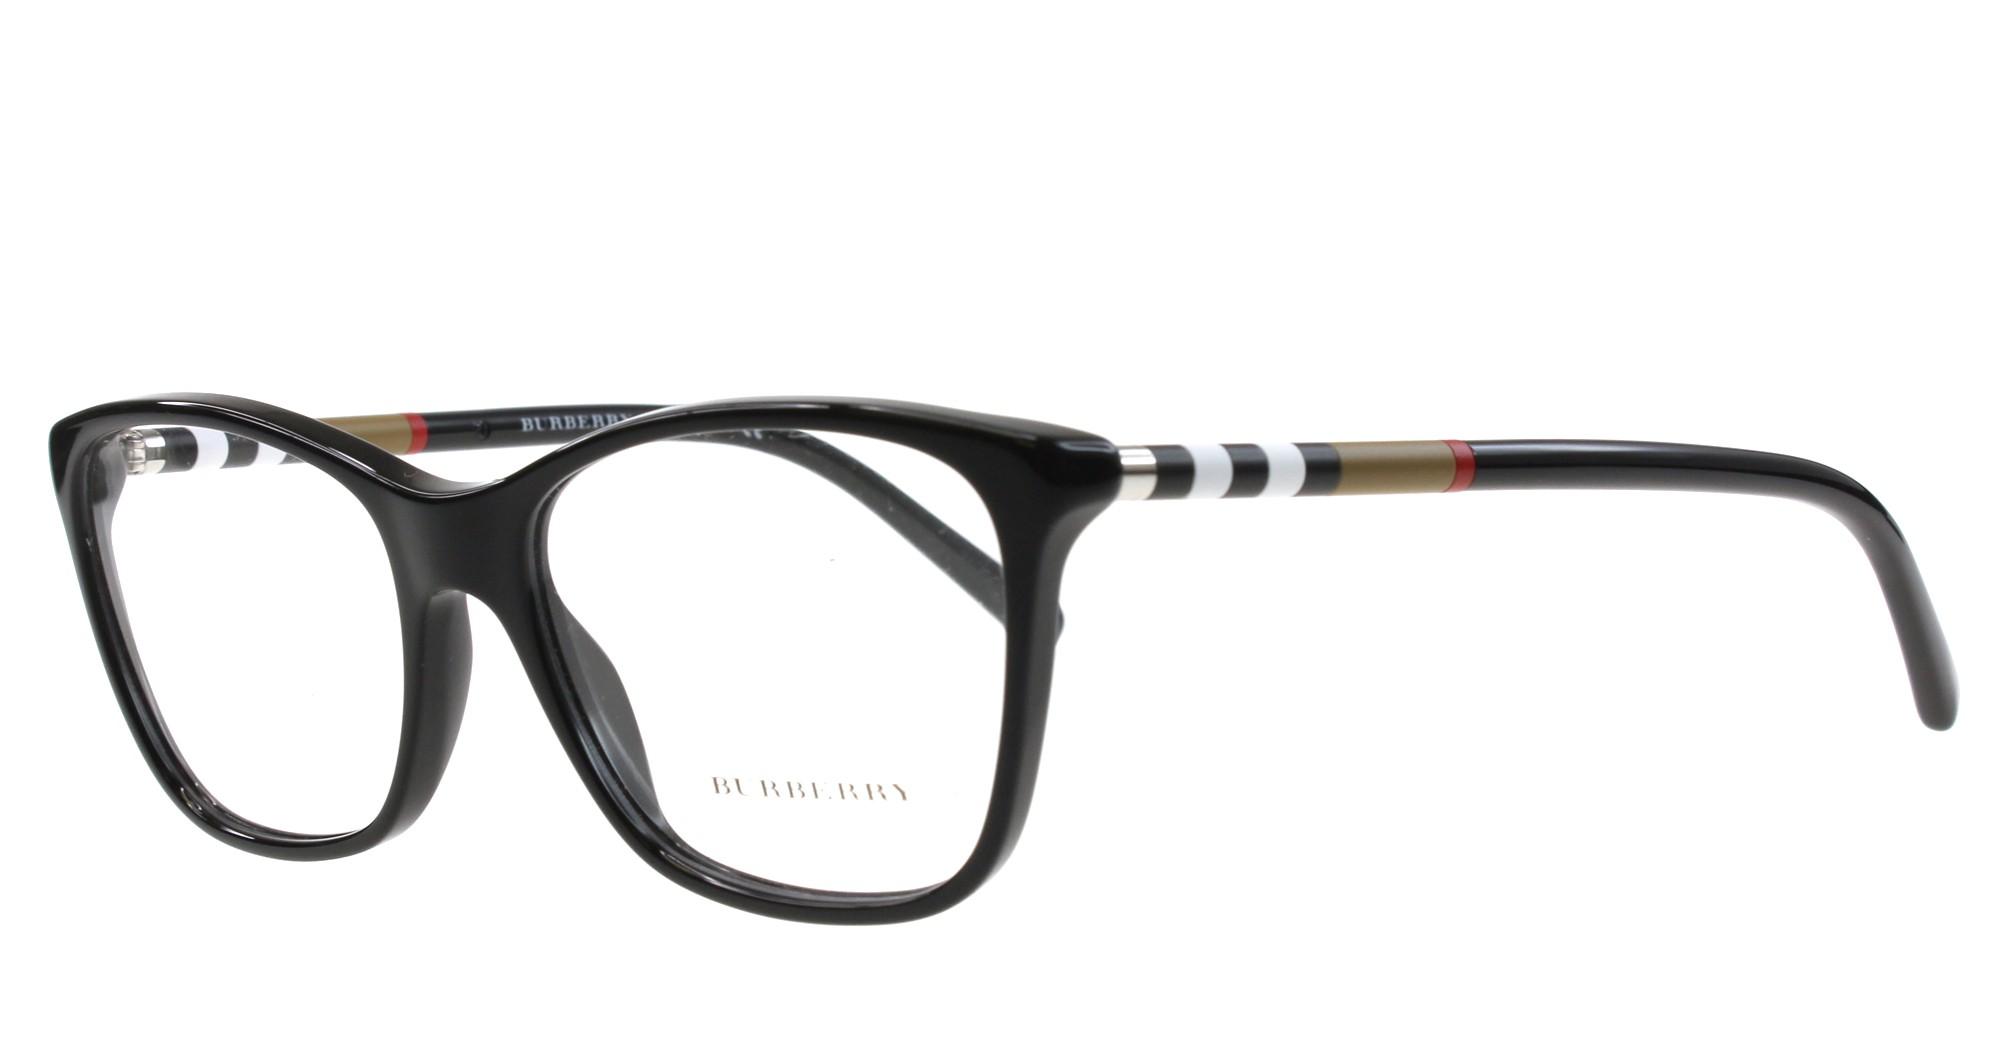 BURBERRY EYEGLASSES BE 2141 - Eyewear Connection